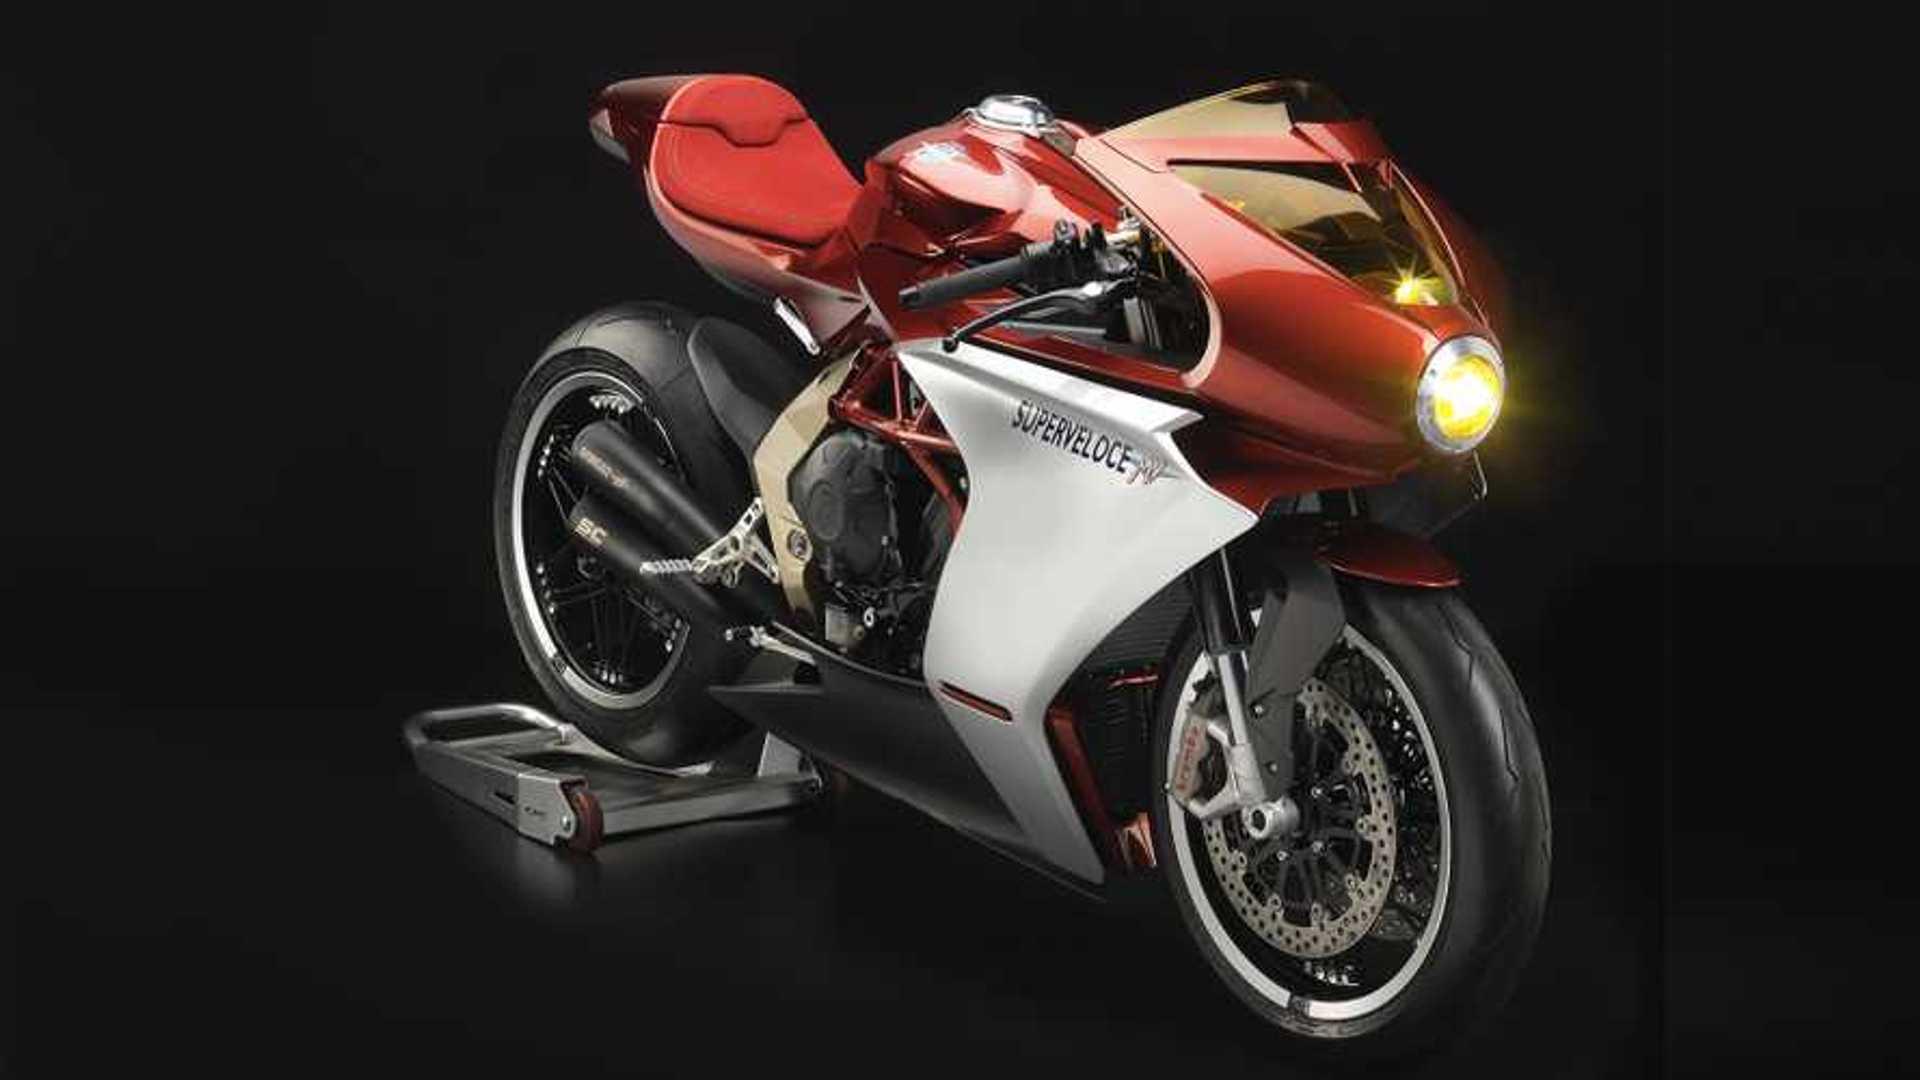 mv-agusta-superveloce-800-concept.jpg